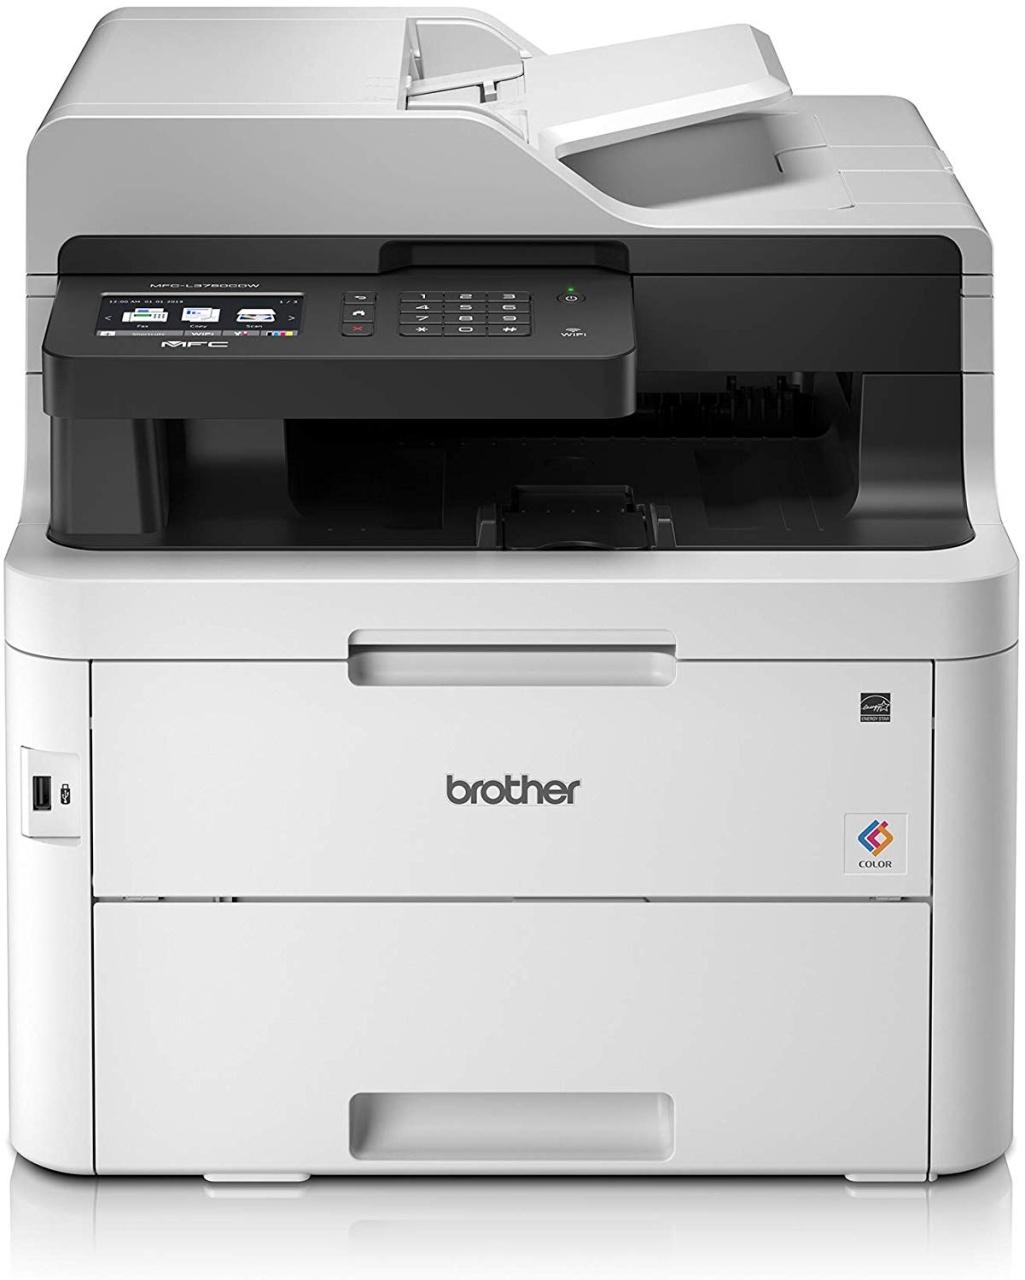 Brother MFC-L3750CDW 4-in-1 Farblaser-Multifunktionsdrucker